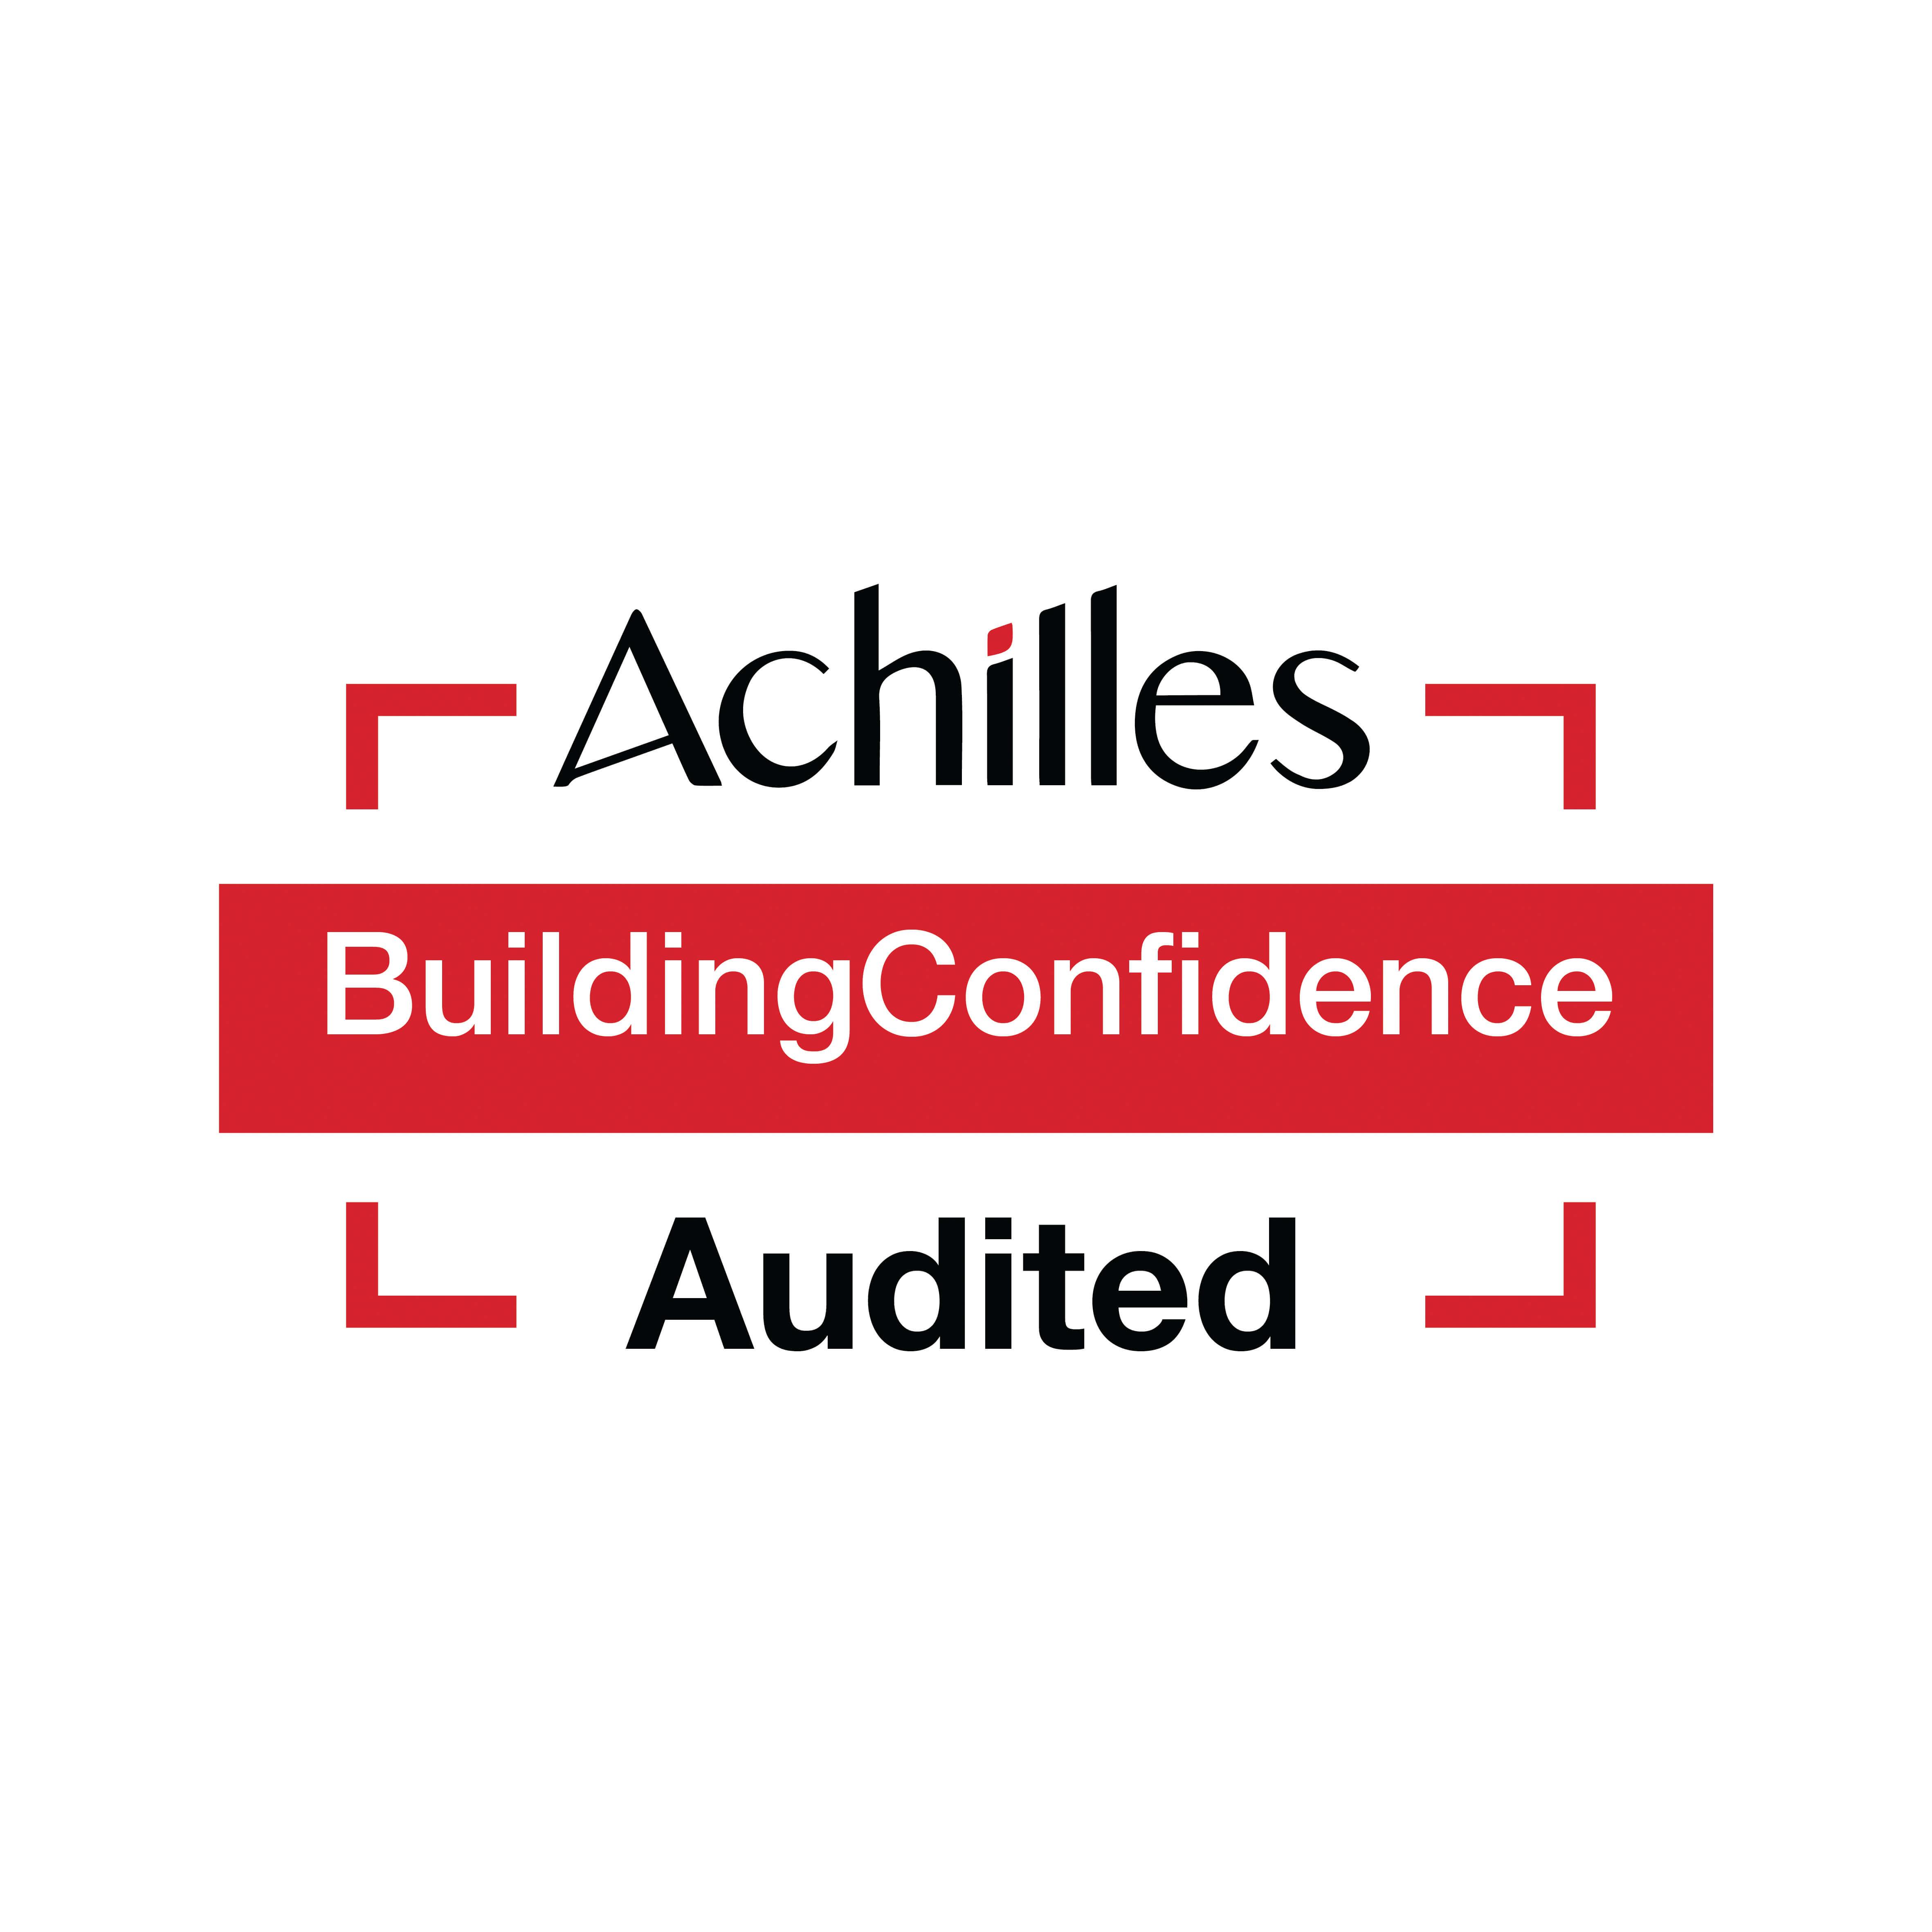 Achilles_Building_Confidence_Audited_Logo.jpg